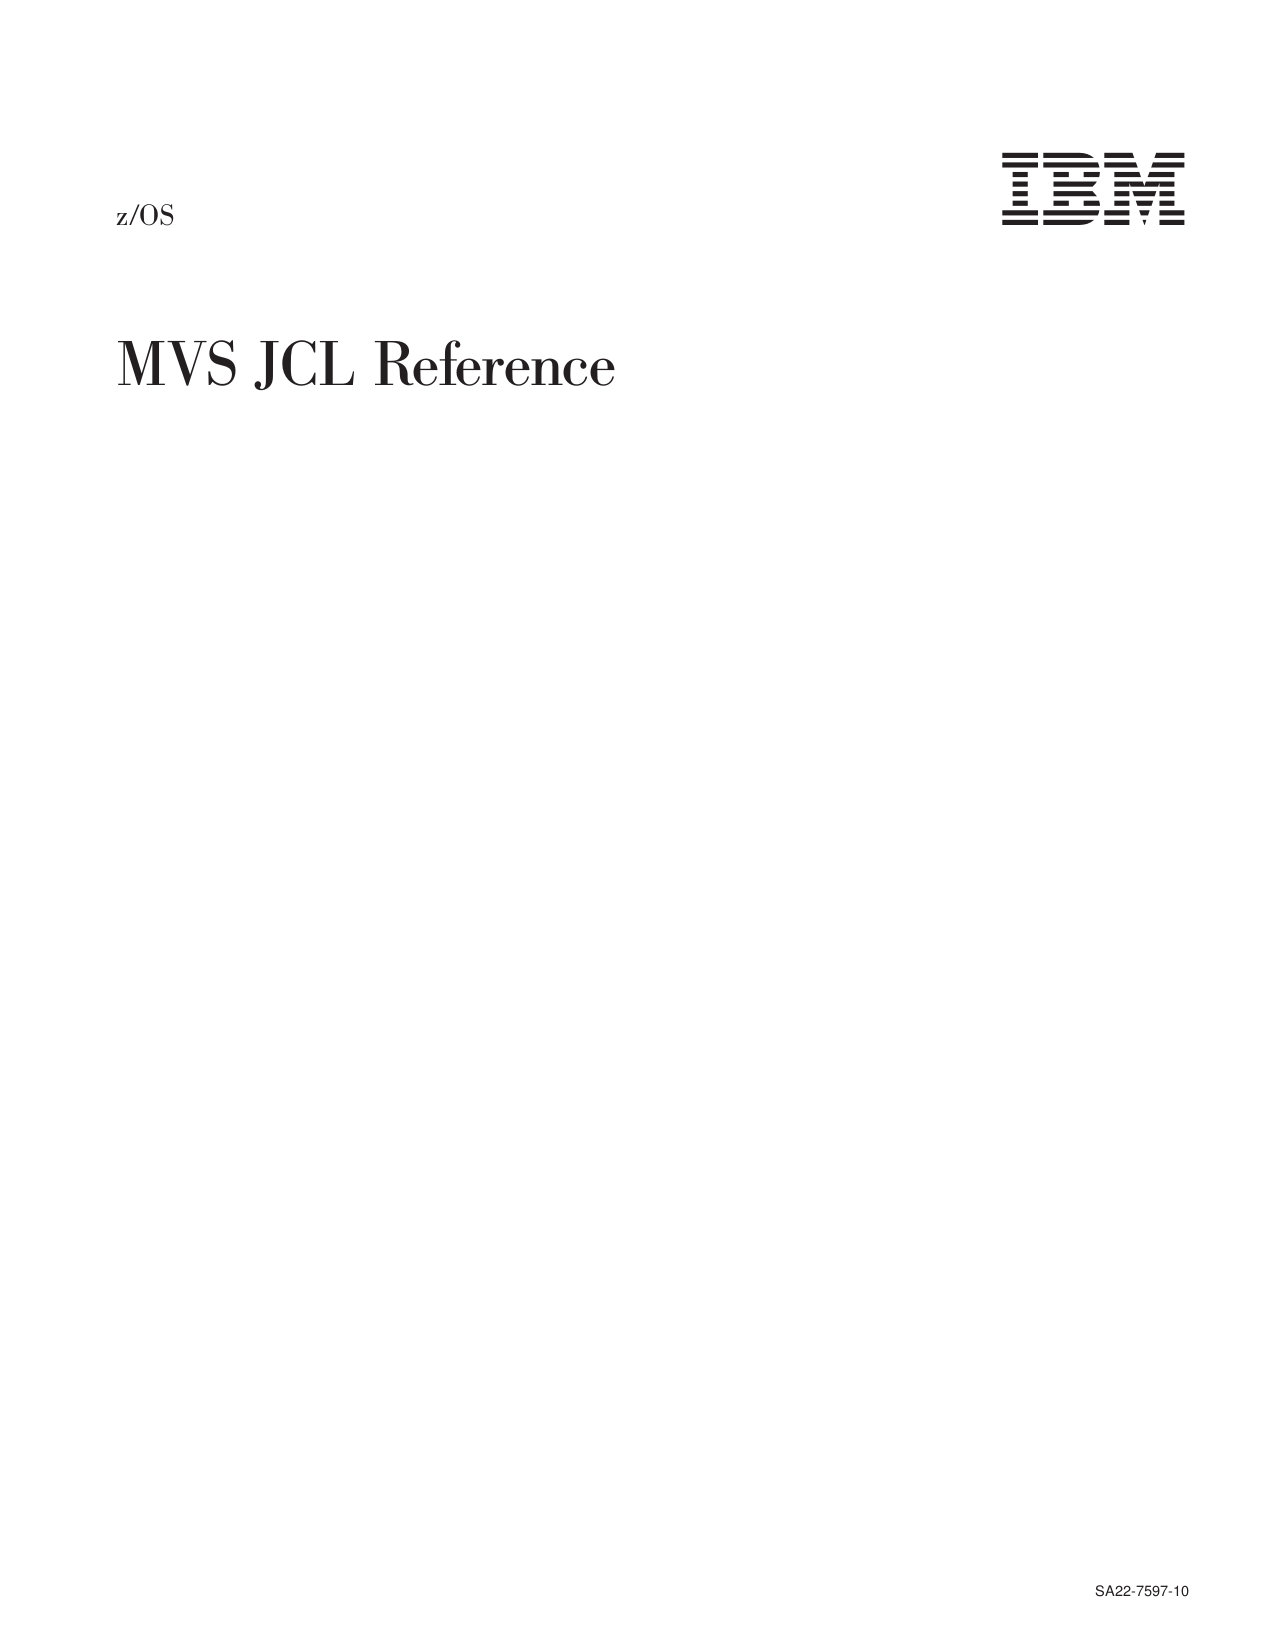 pdf manual for oneil printer rp 1000 rh umlib com  ibm z/os jcl reference manual pdf